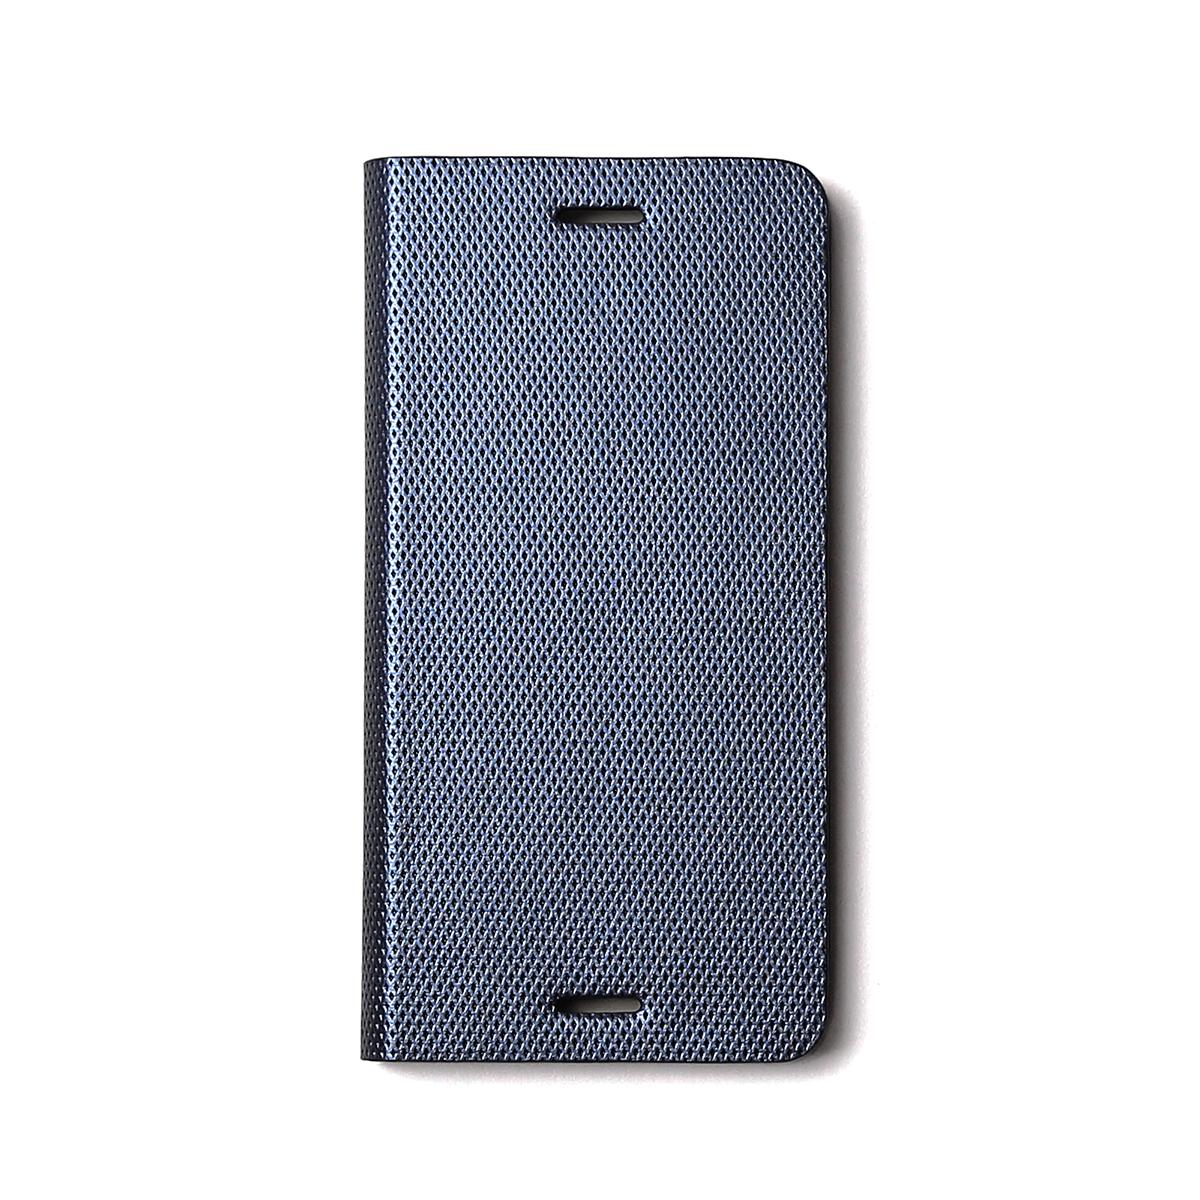 Xperia X Performance ケース 手帳型 ZENUS Metallic Diary(ゼヌス メタリックダイアリー)エクスペリア エックス パフォーマンス SO-04H SOV33 502SO カバー